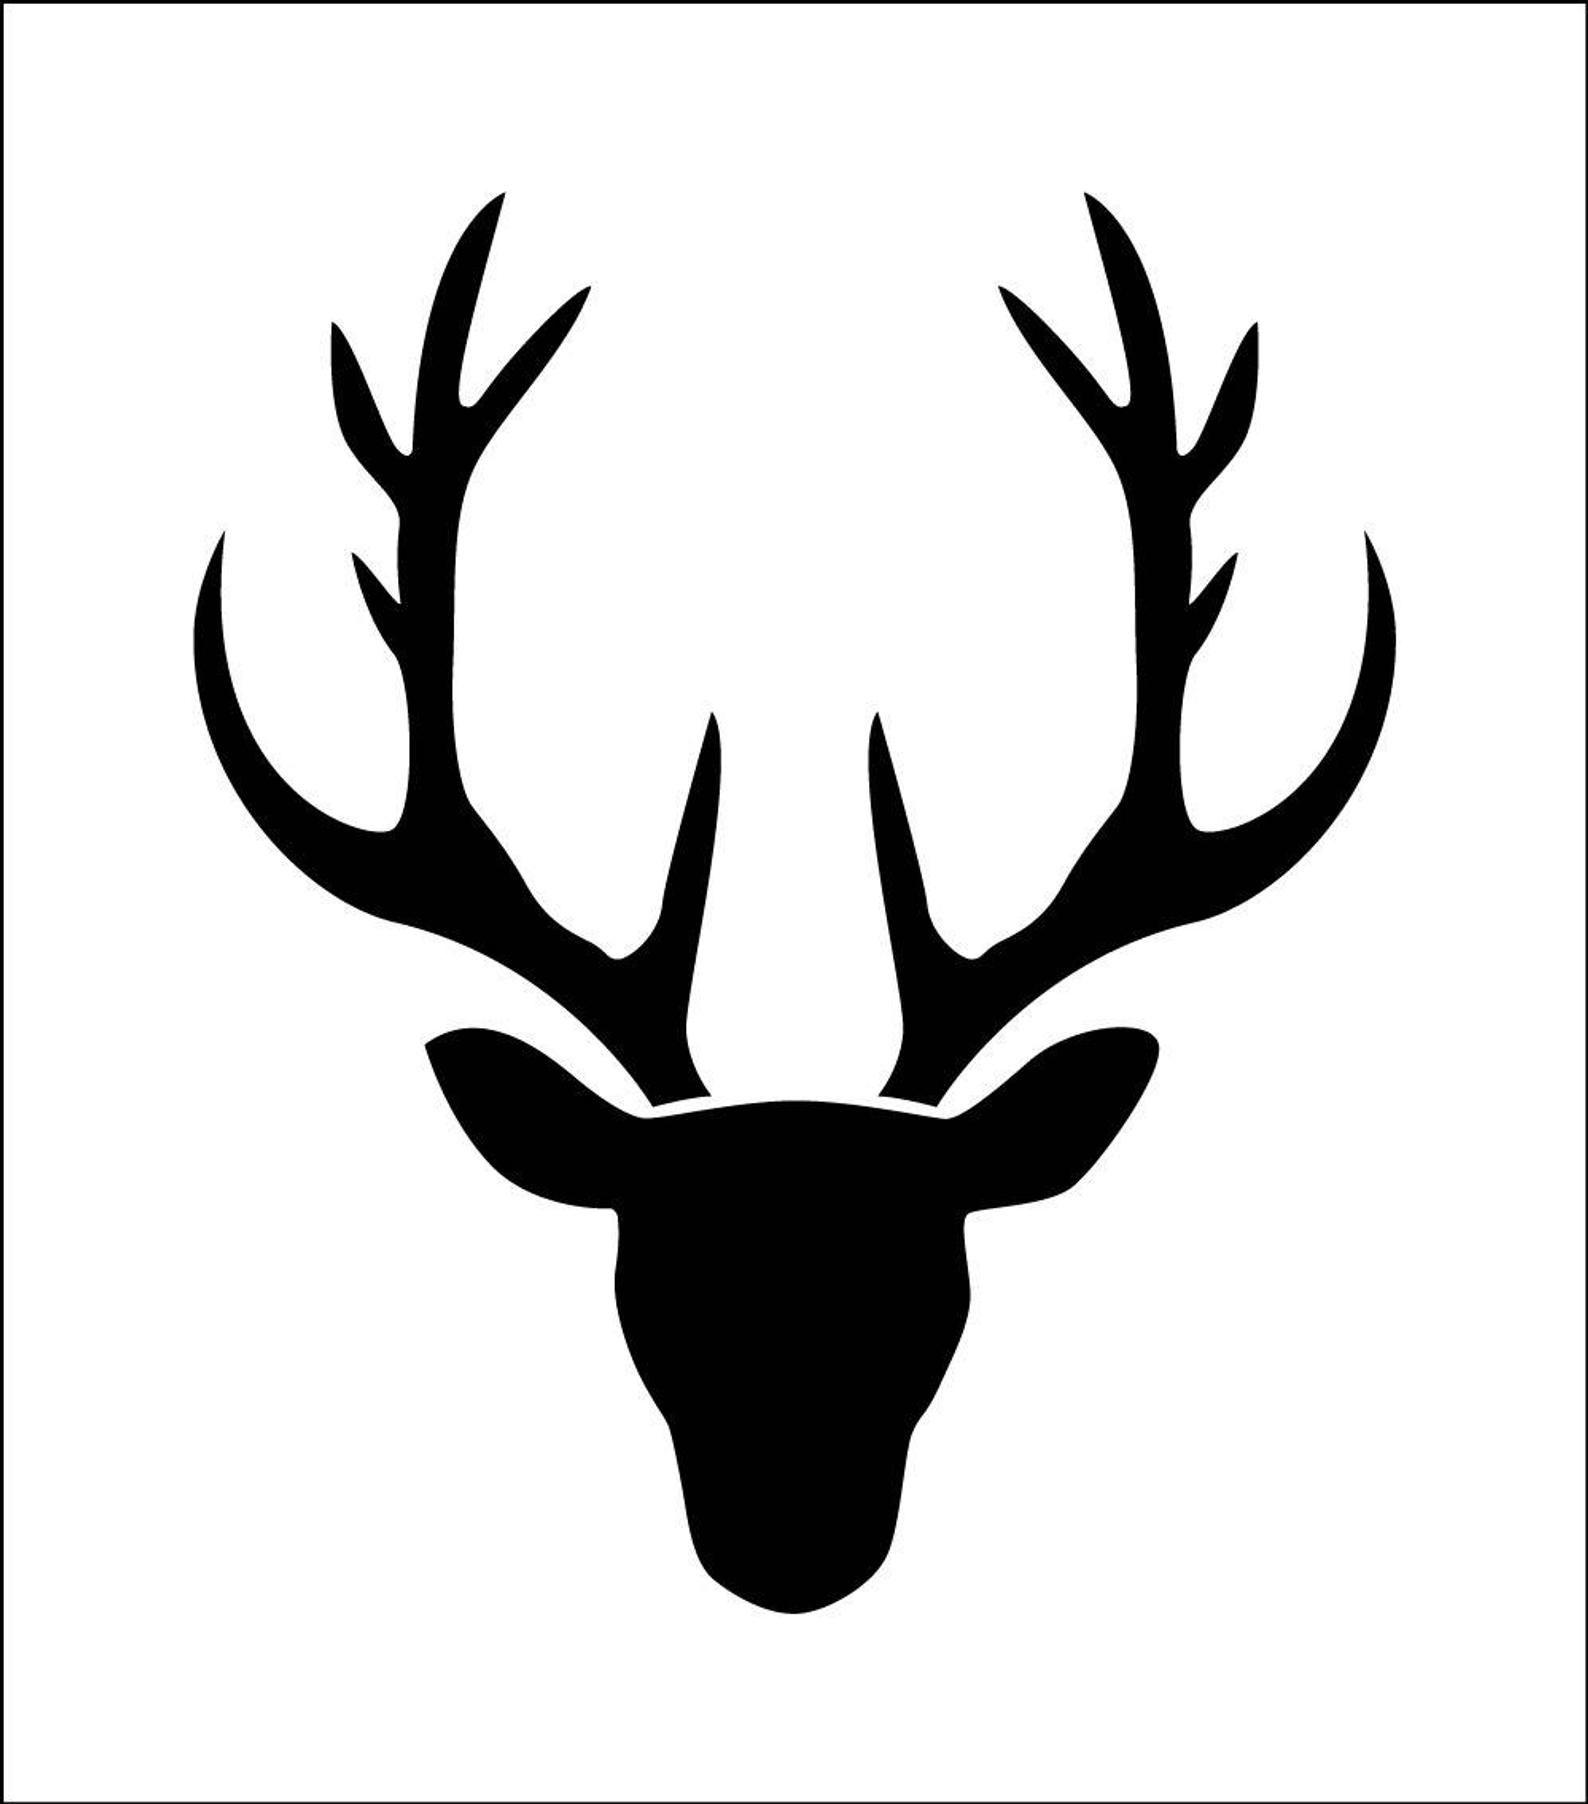 Cerf Silhouette De Tete De Cerf Petit Pochoir En Vinyle Etsy Deer Head Silhouette Deer Silhouette Deer Head